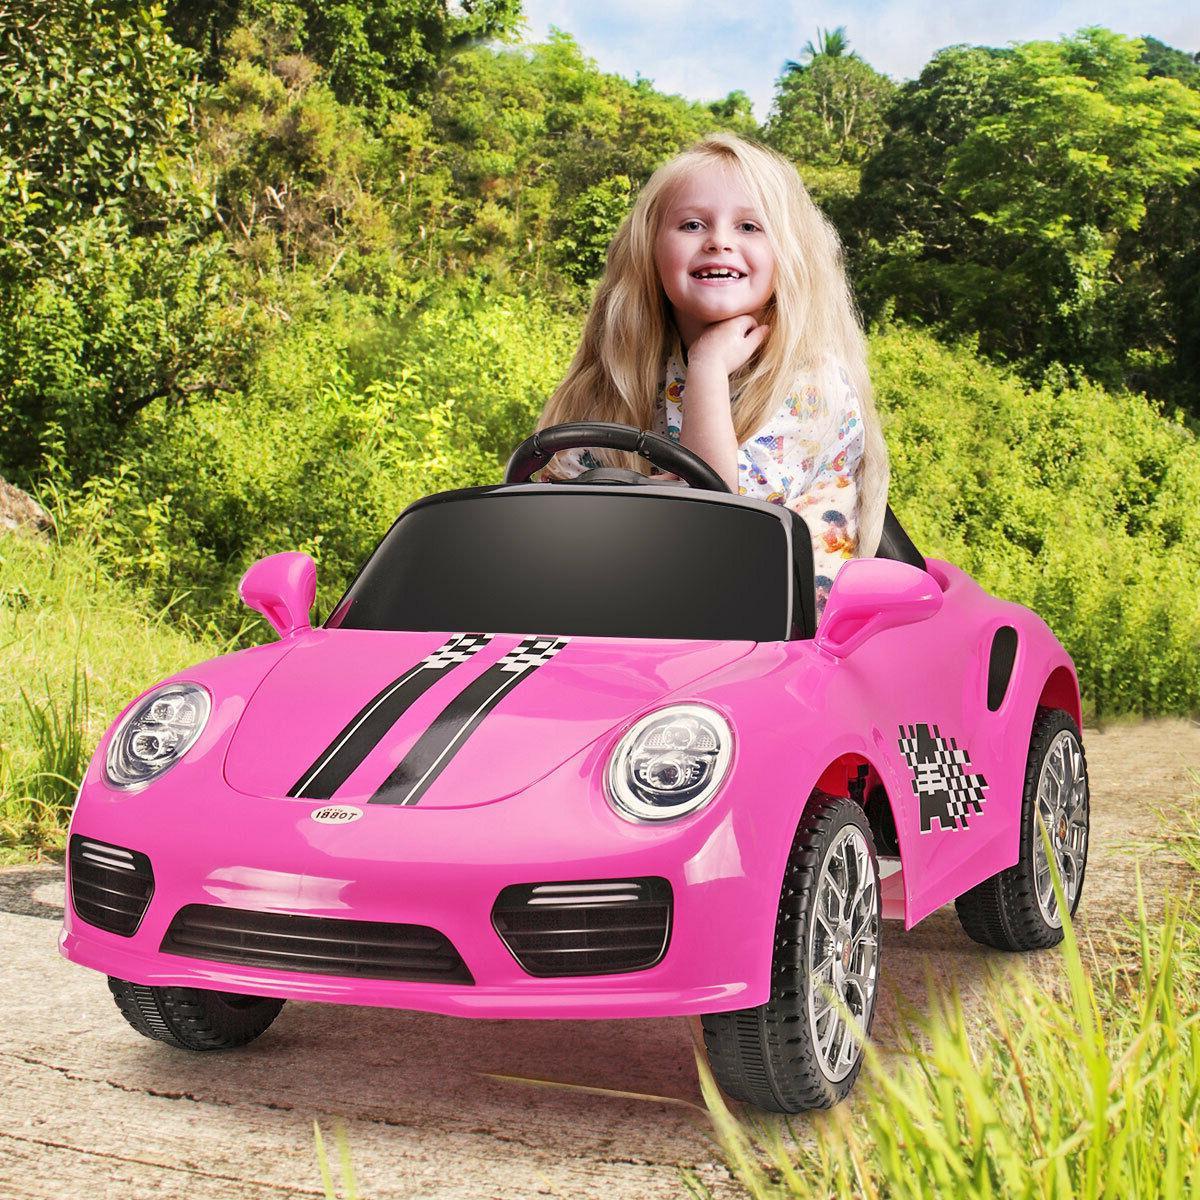 Pink Toys w/Headlights